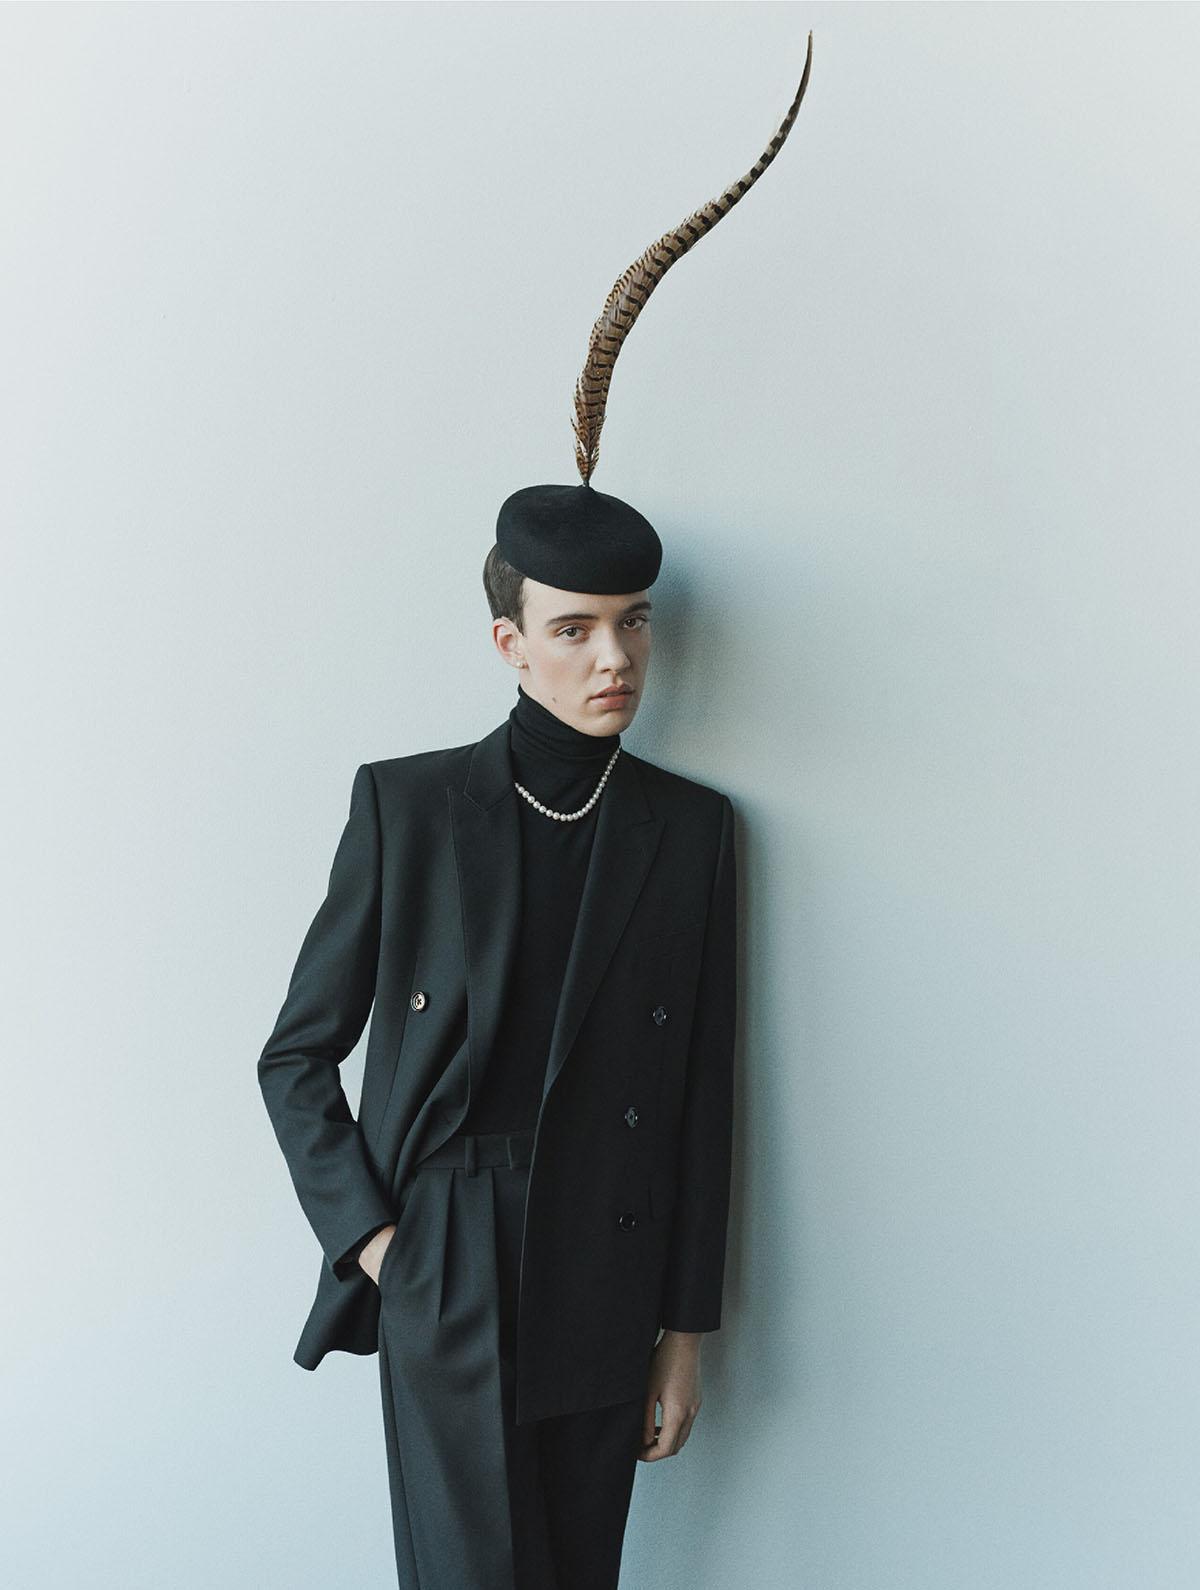 Oslo Grace by Tom Schirmacher for Elle UK March 2021